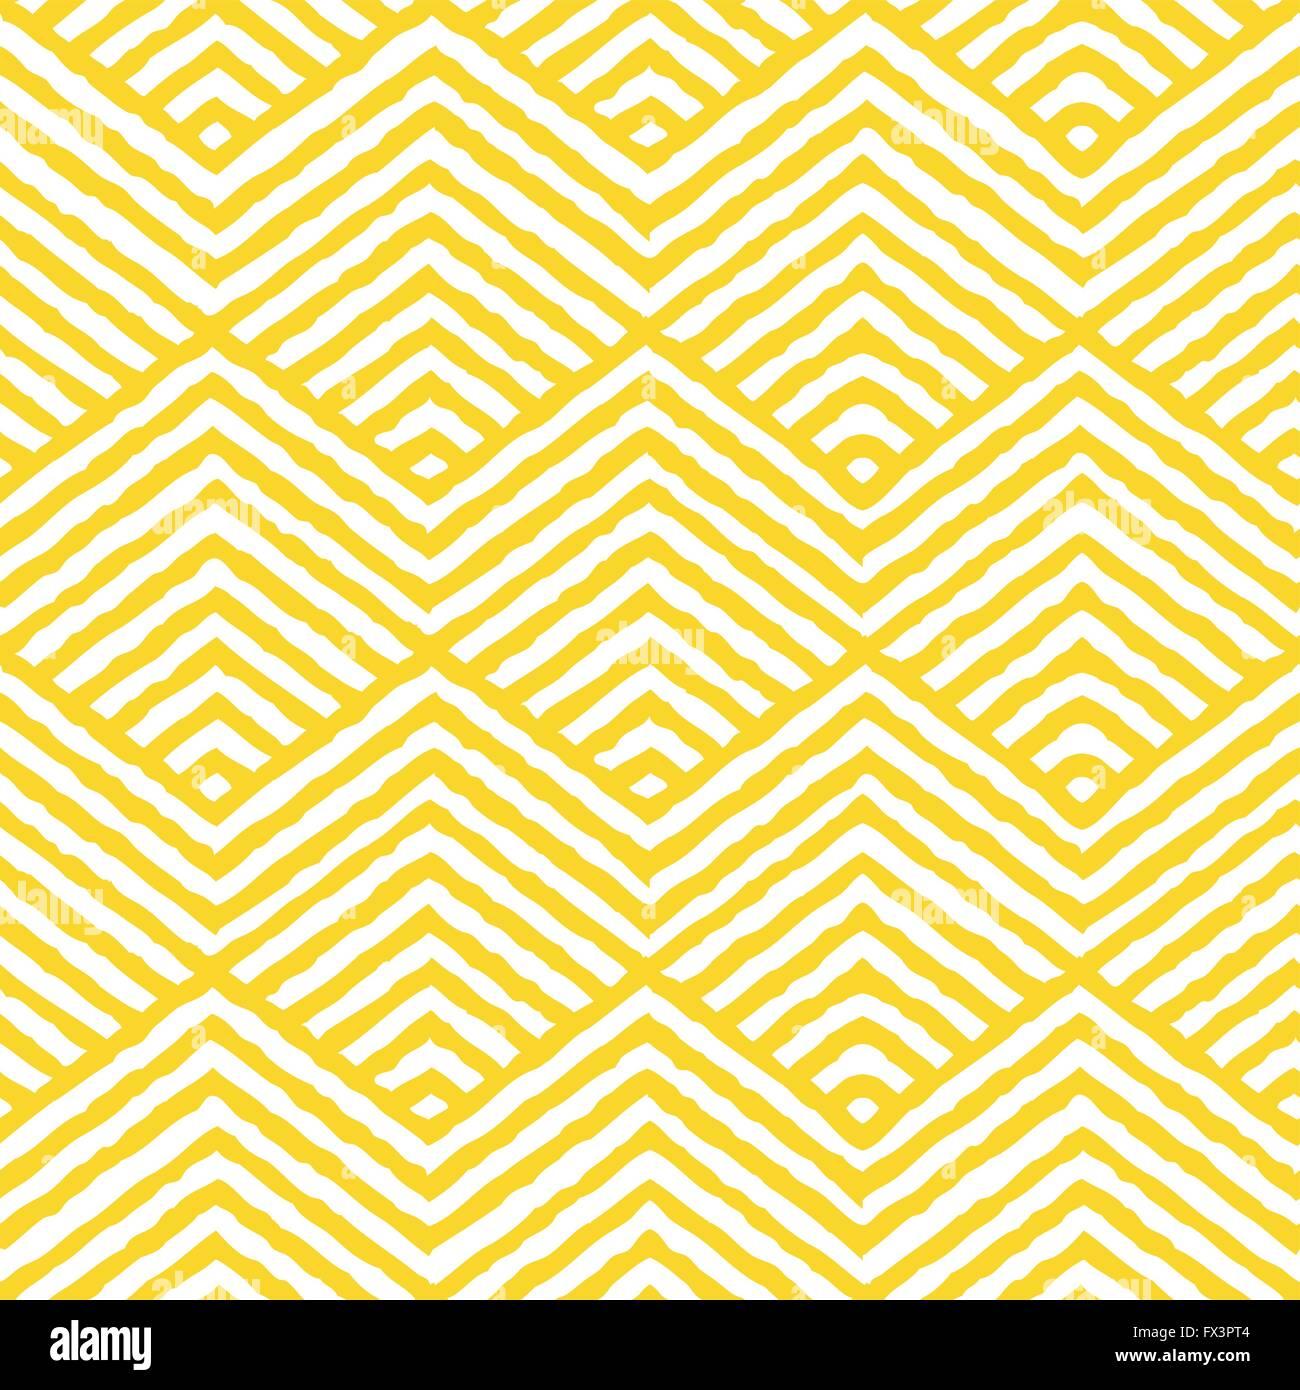 Seamless Vector Geometric Pattern. Repeating geometric texture pattern. Vector illustration. - Stock Image